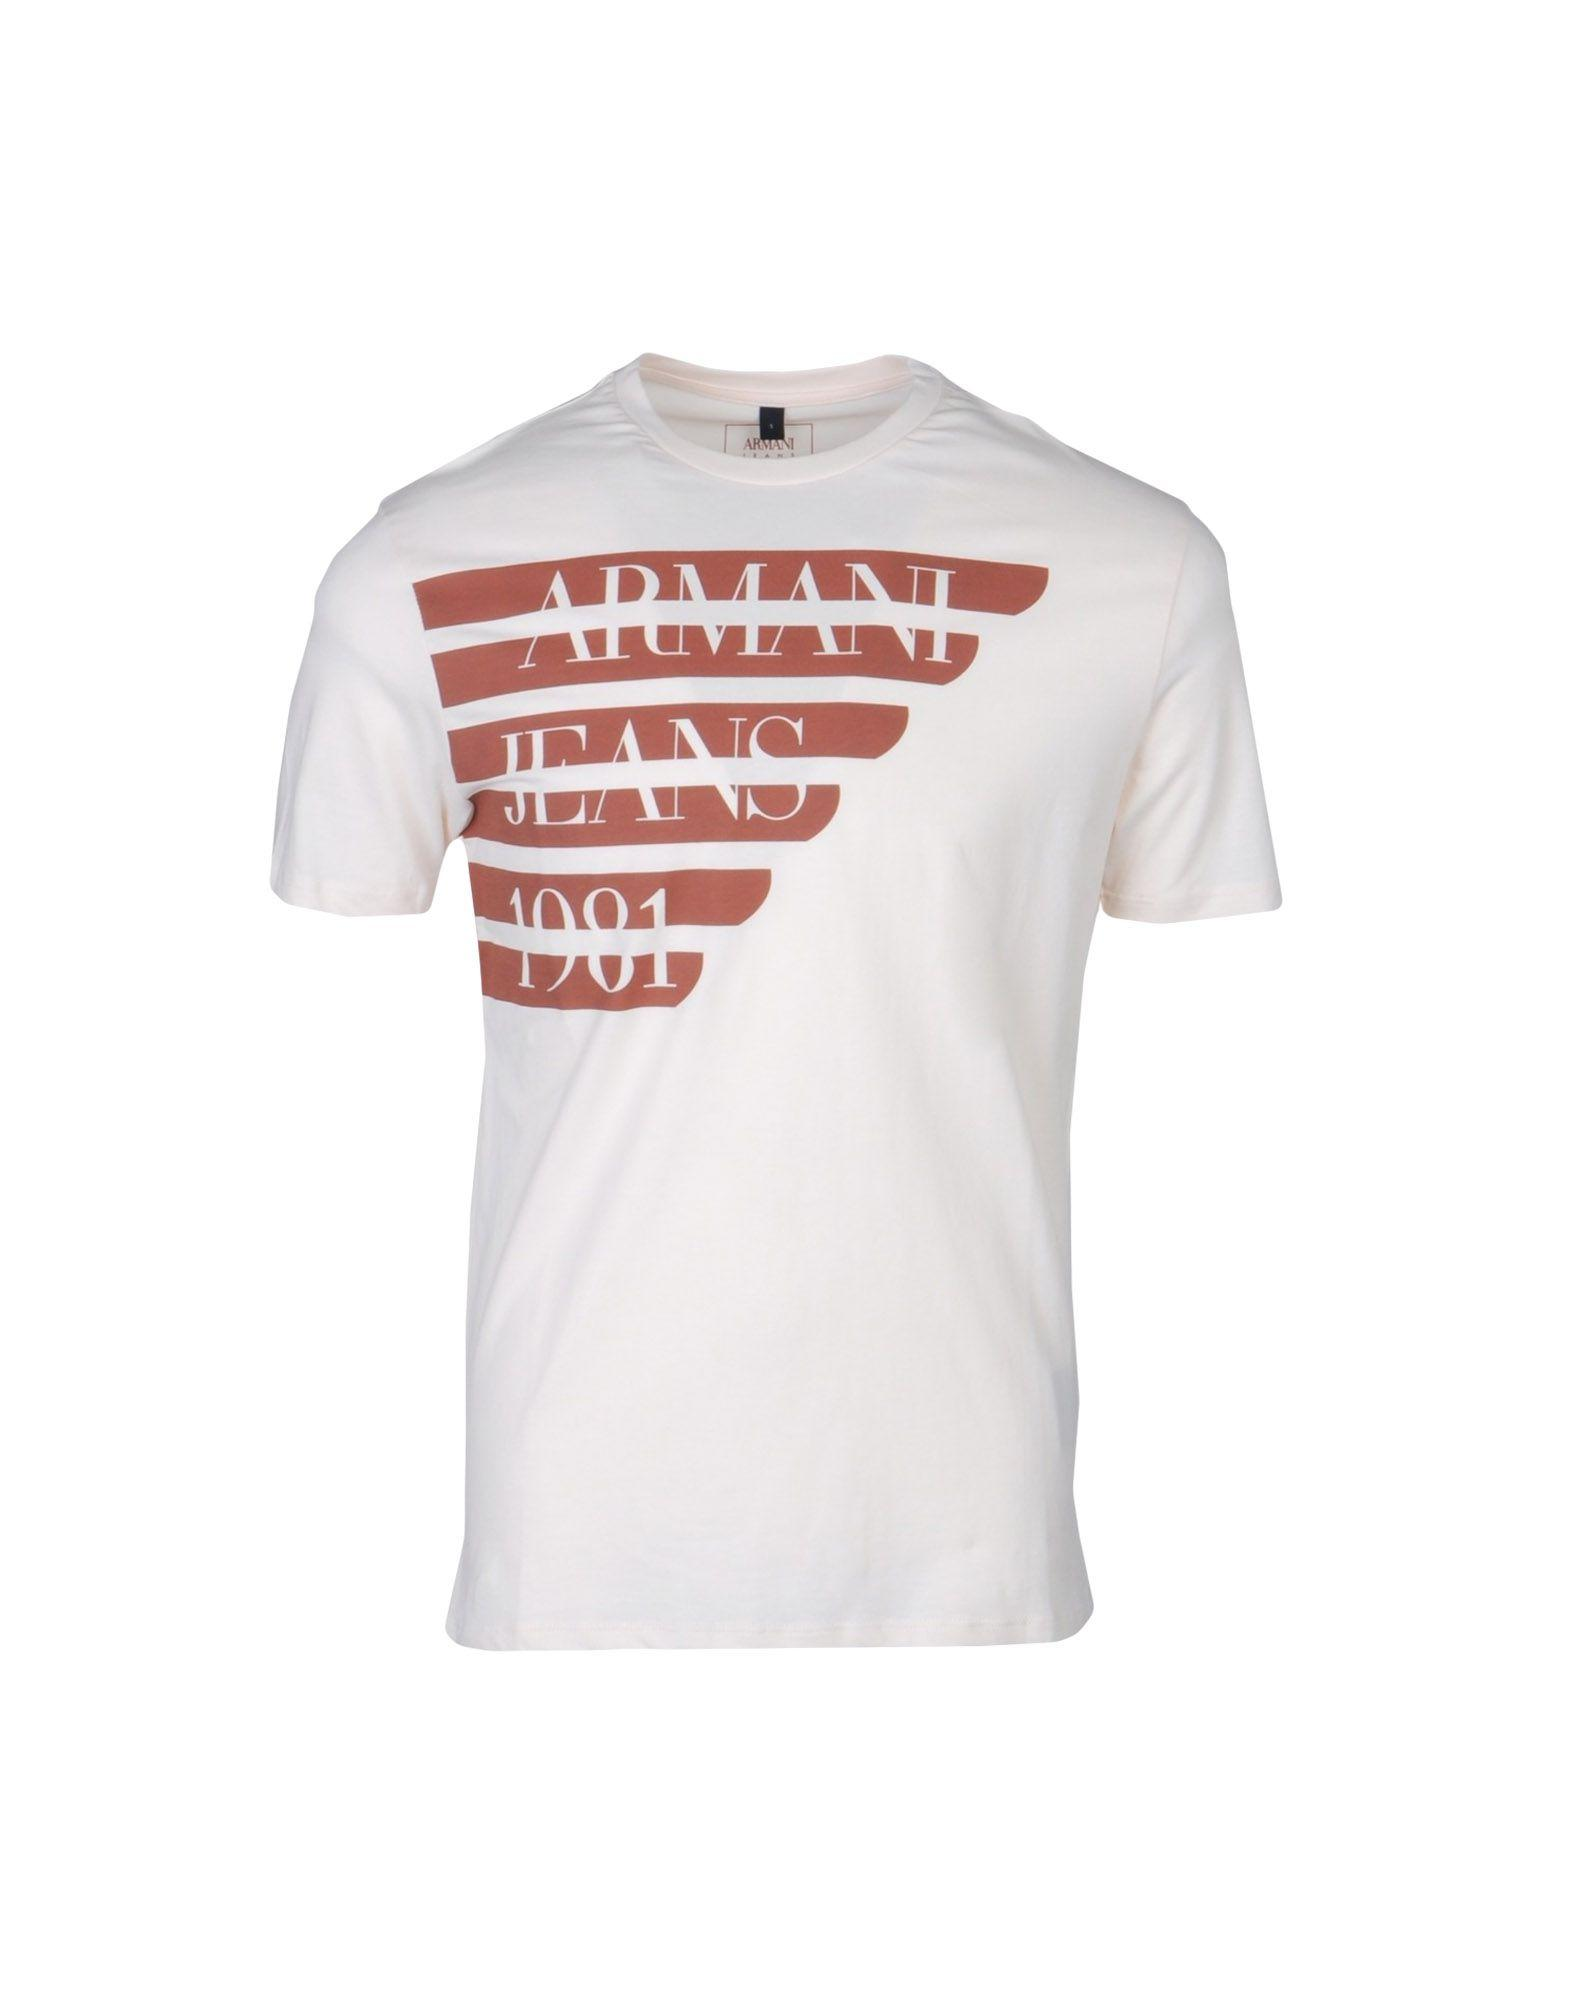 Armani Jeans T-shirts In Tan